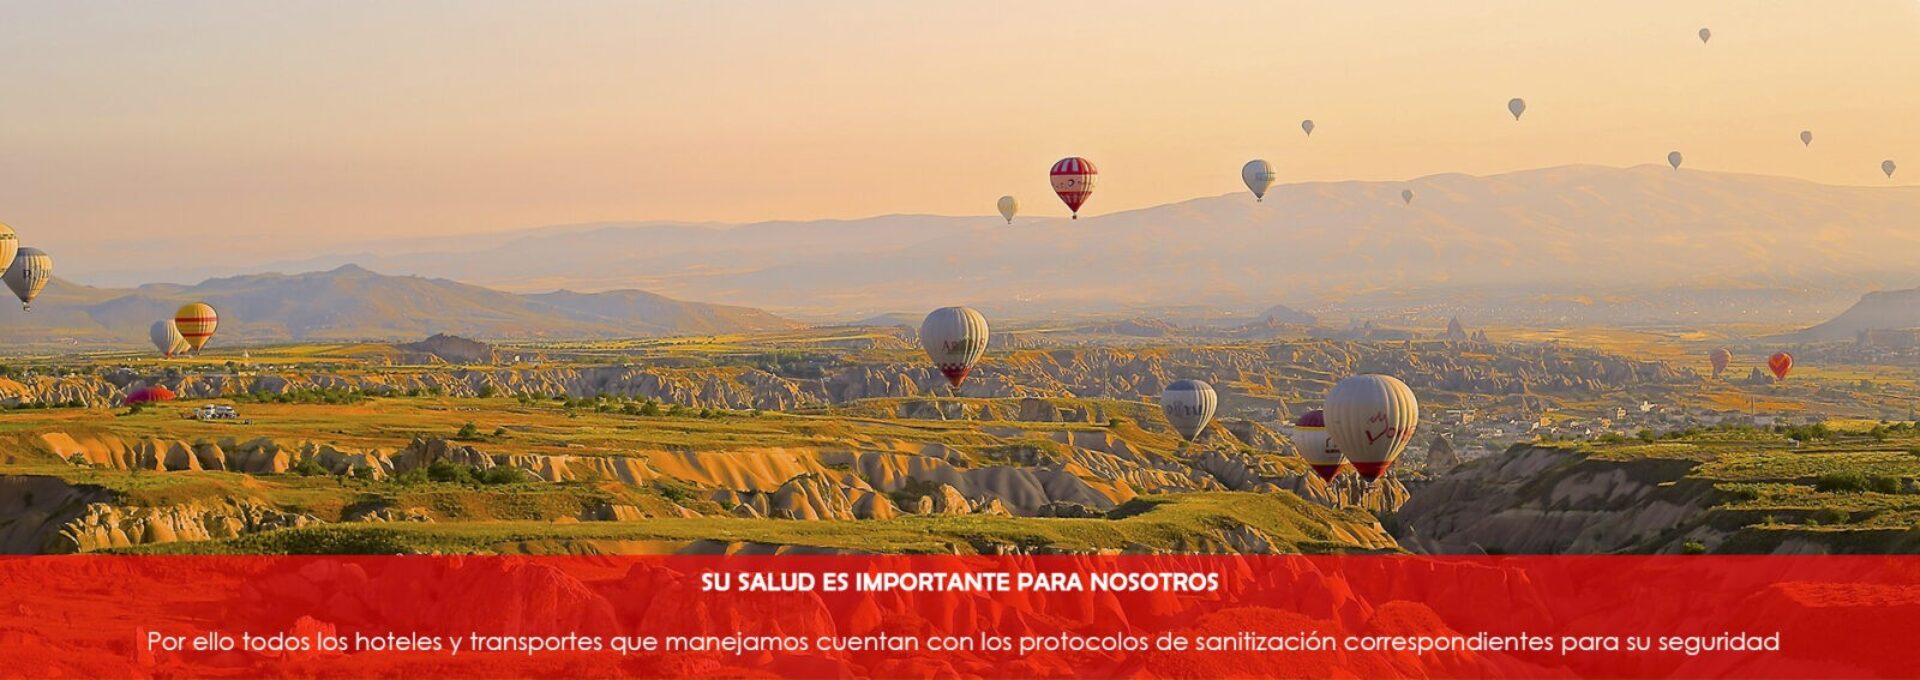 VGM TOURS Agencia de Viajes